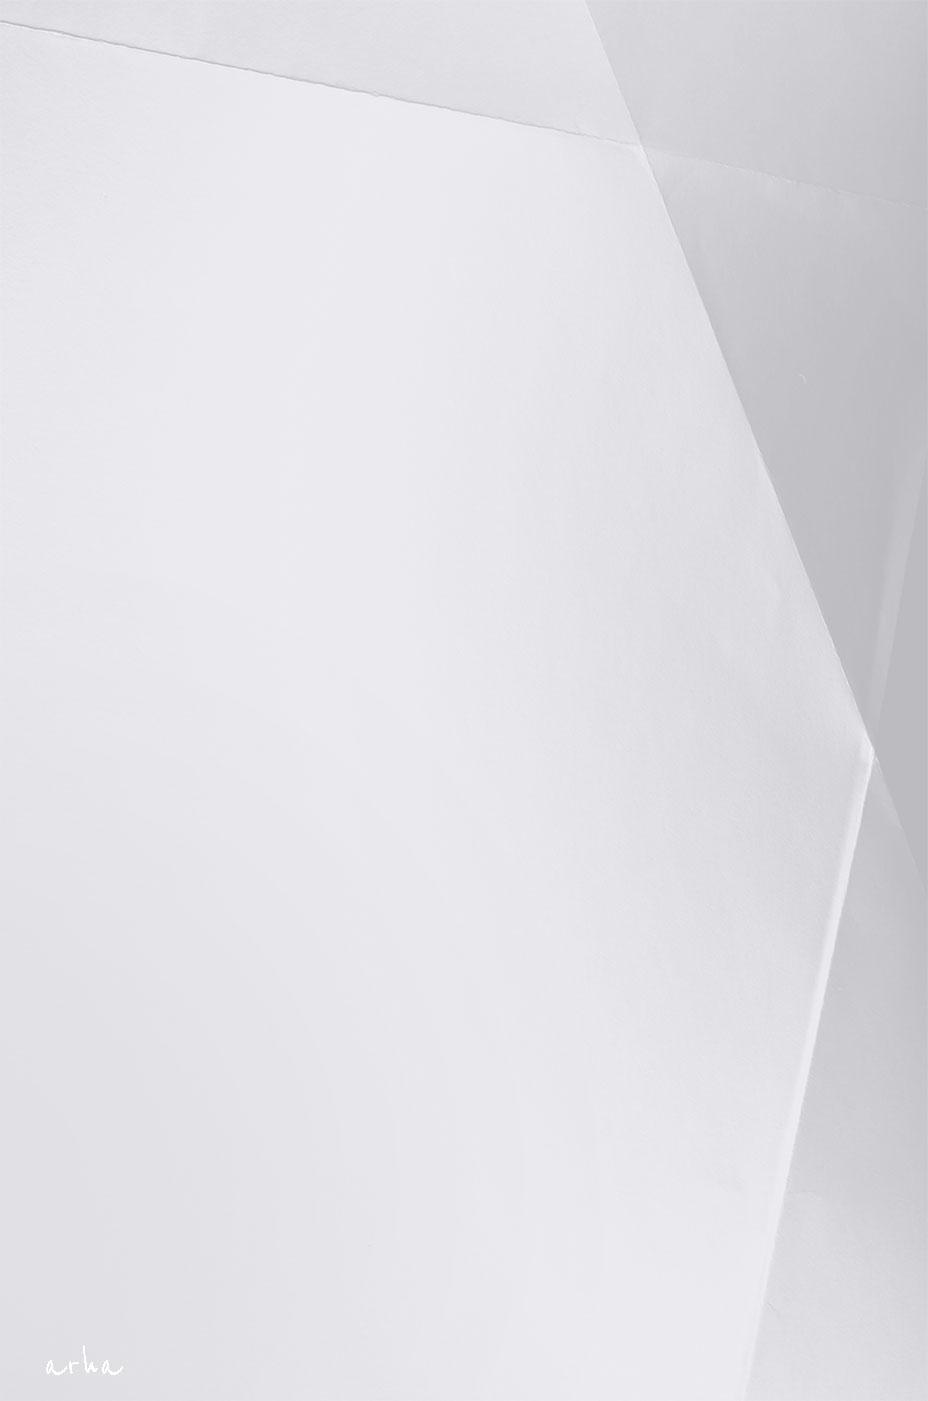 Gem-paper-table-AC-copyright-2012-arha-Tomomichi-Morifuji